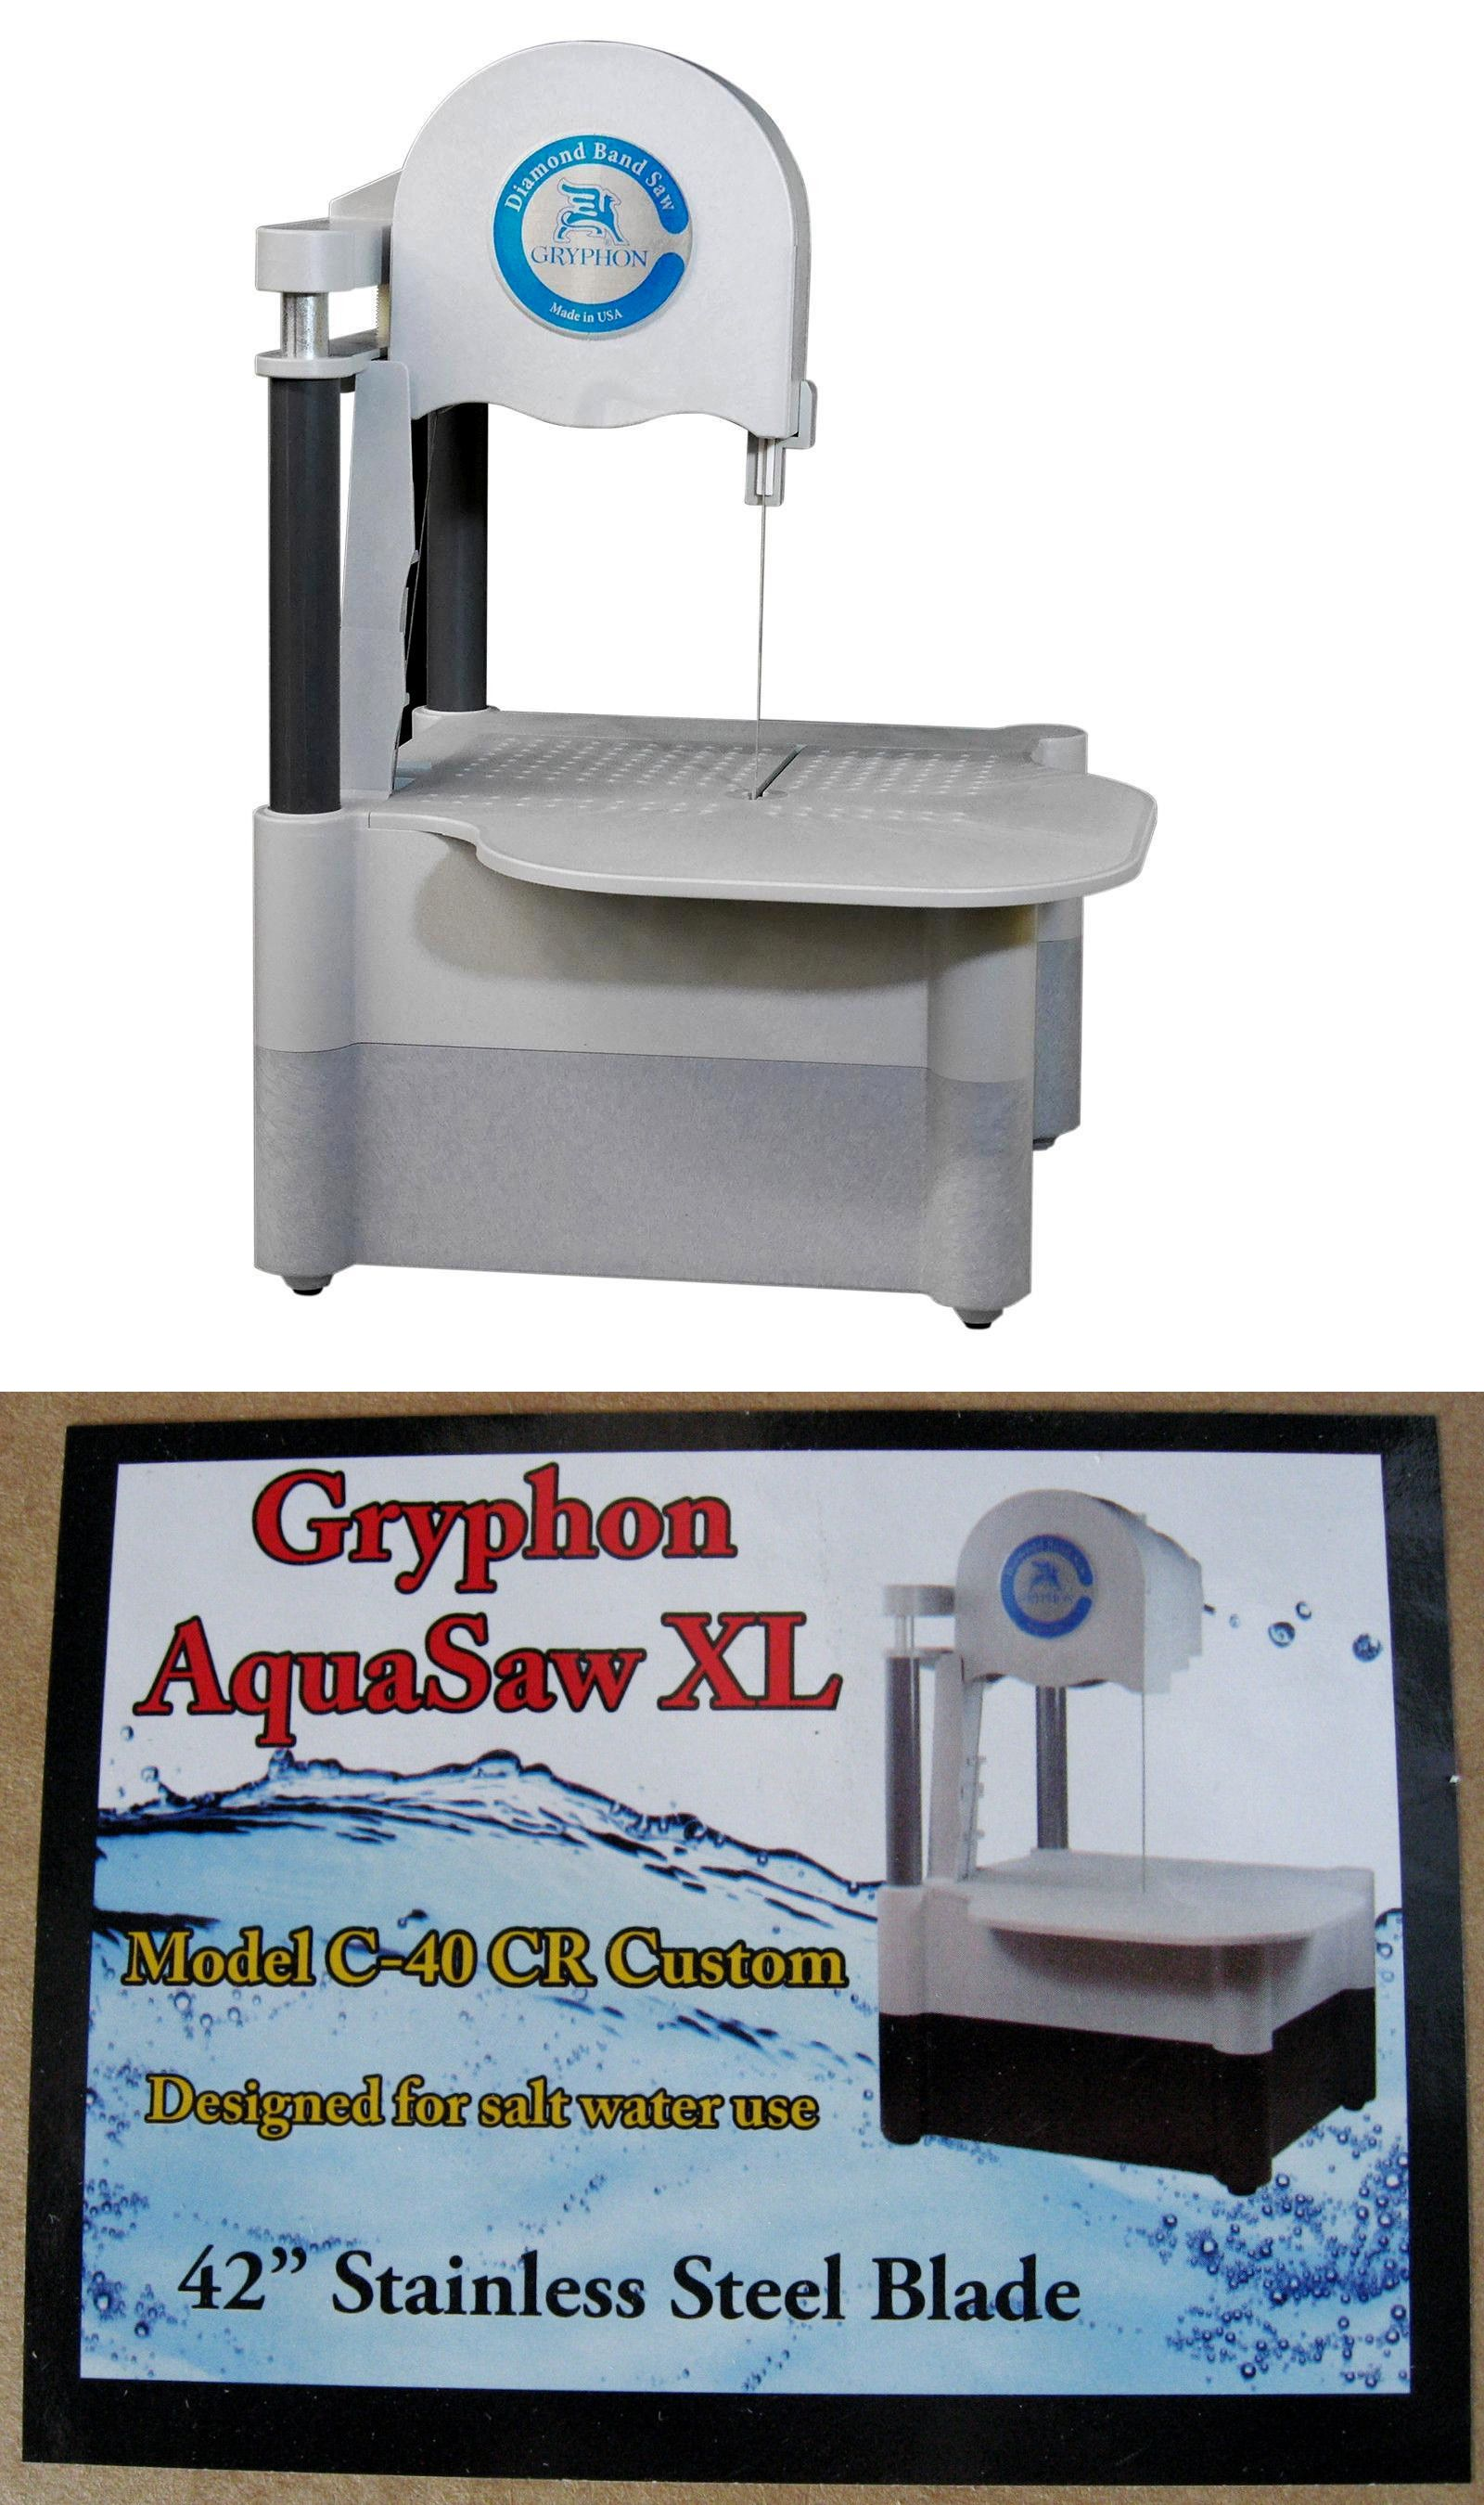 Glass Art Tools 3101: Rle Gryphon C-40Cr Xl Custom Diamond Band Saw ...